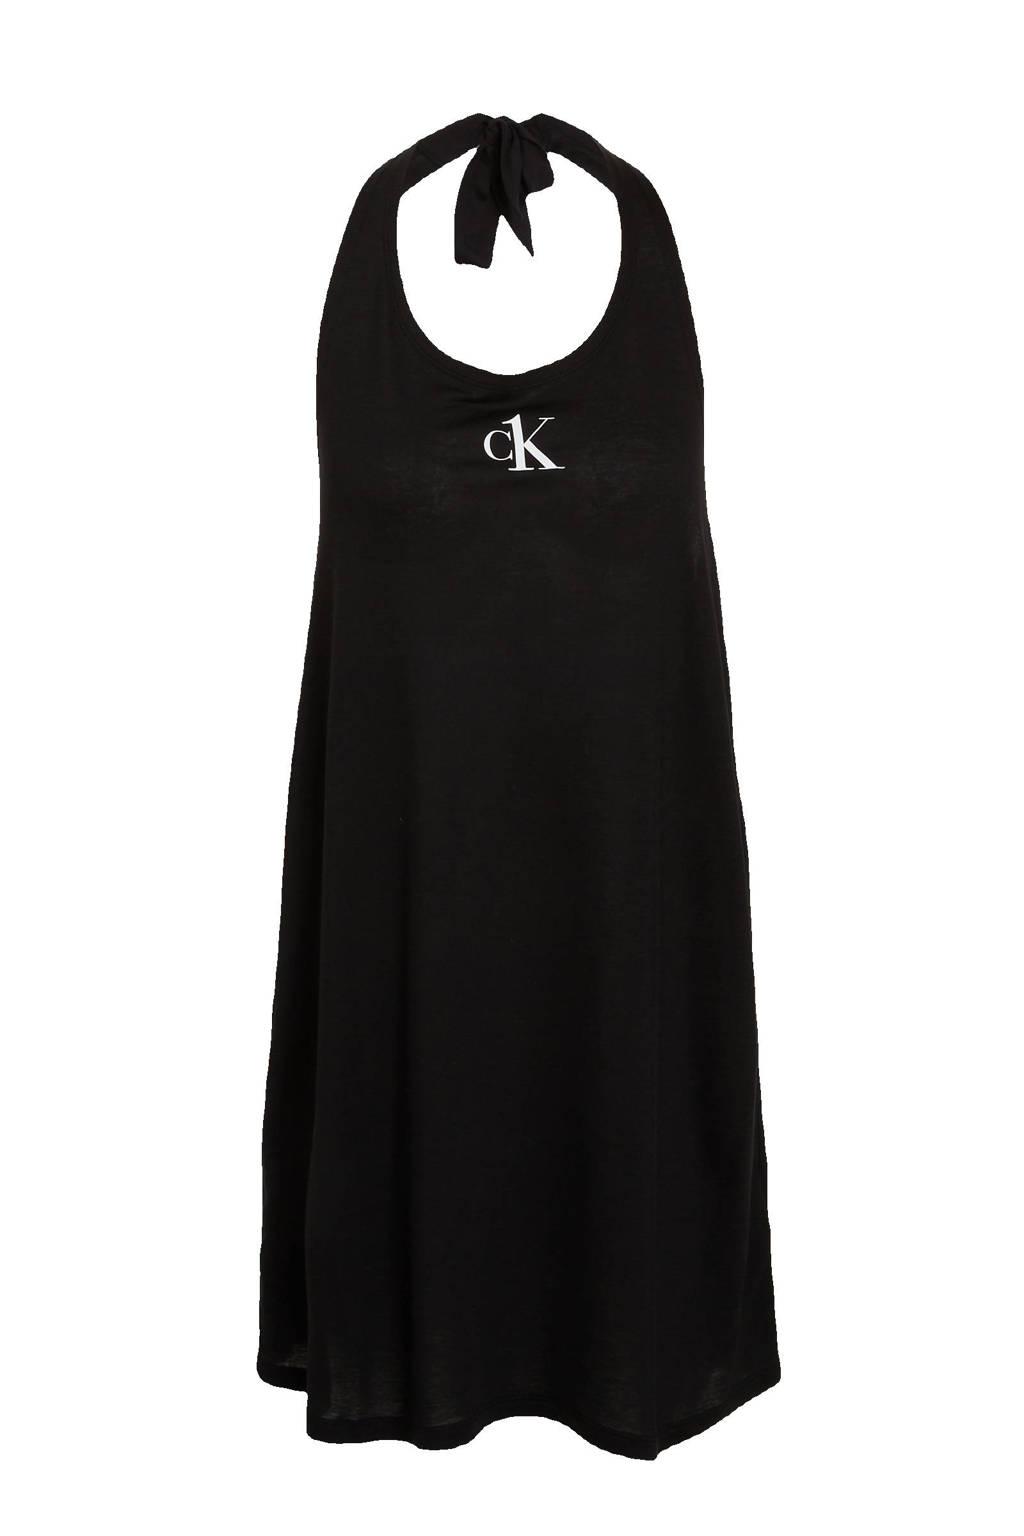 CALVIN KLEIN halter strandjurk met logo zwart, Zwart